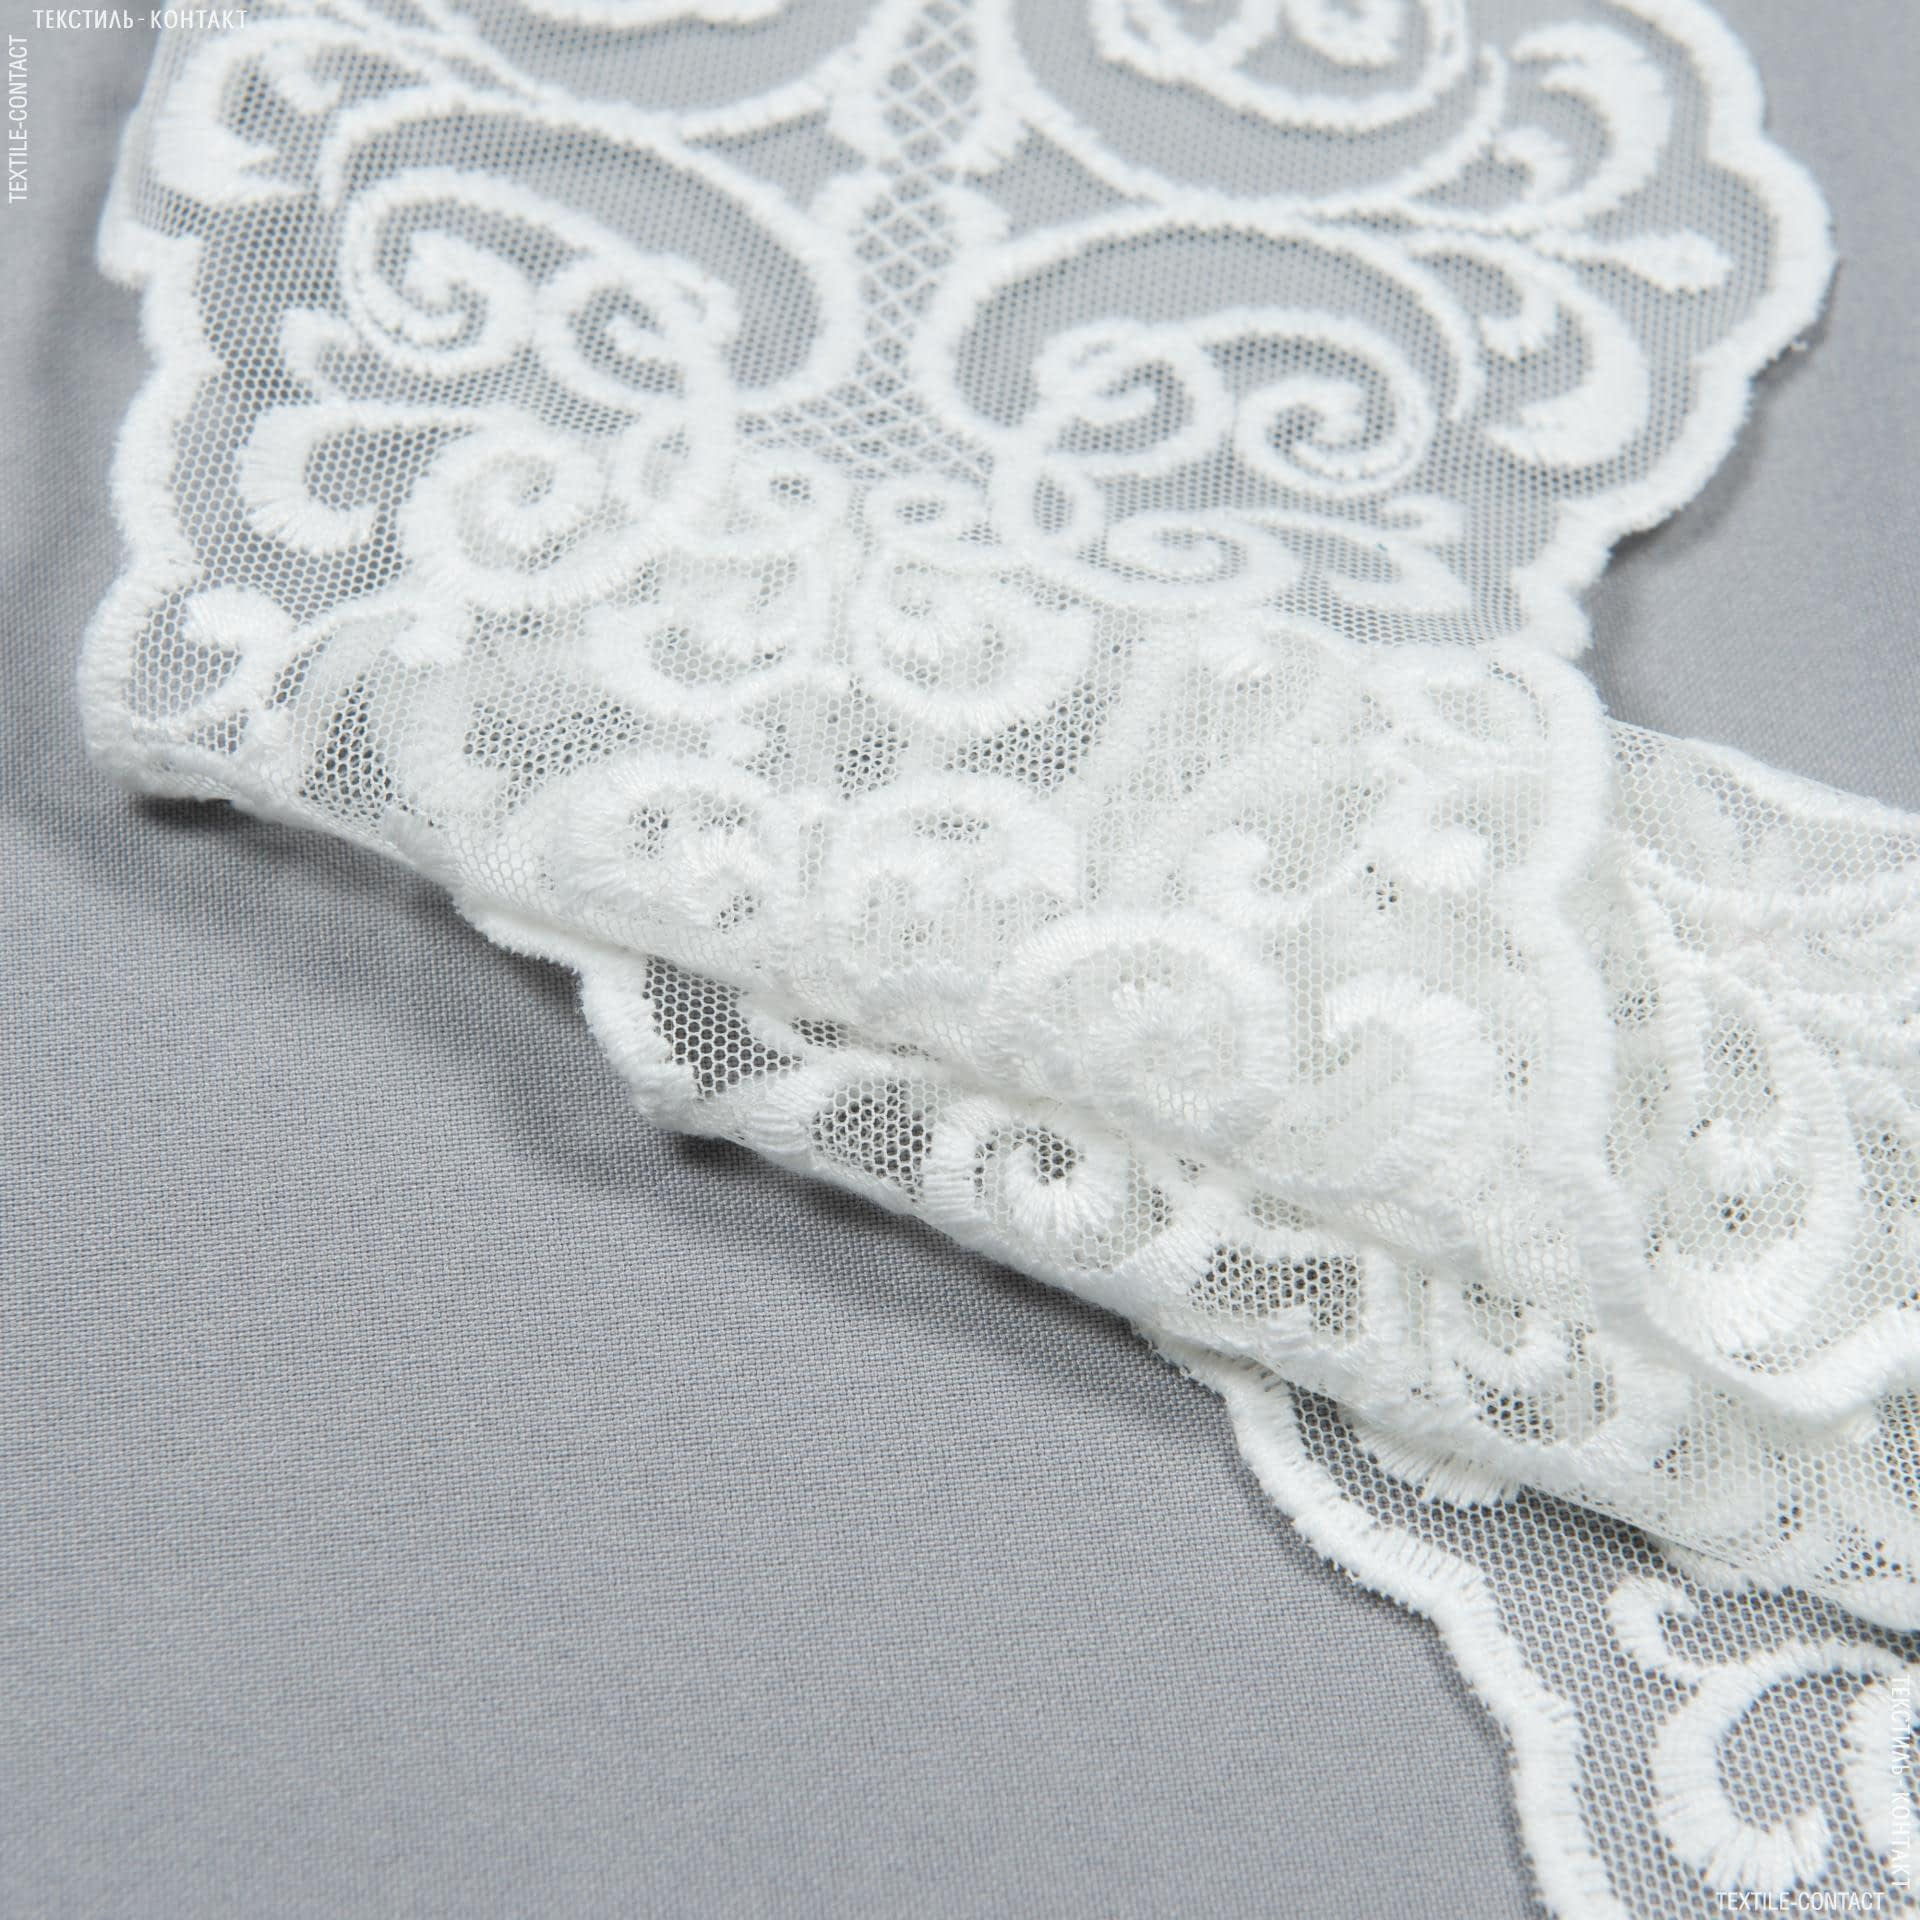 Ткани для пэчворка - Декоративное  кружево  ливия/ молочный 16 см